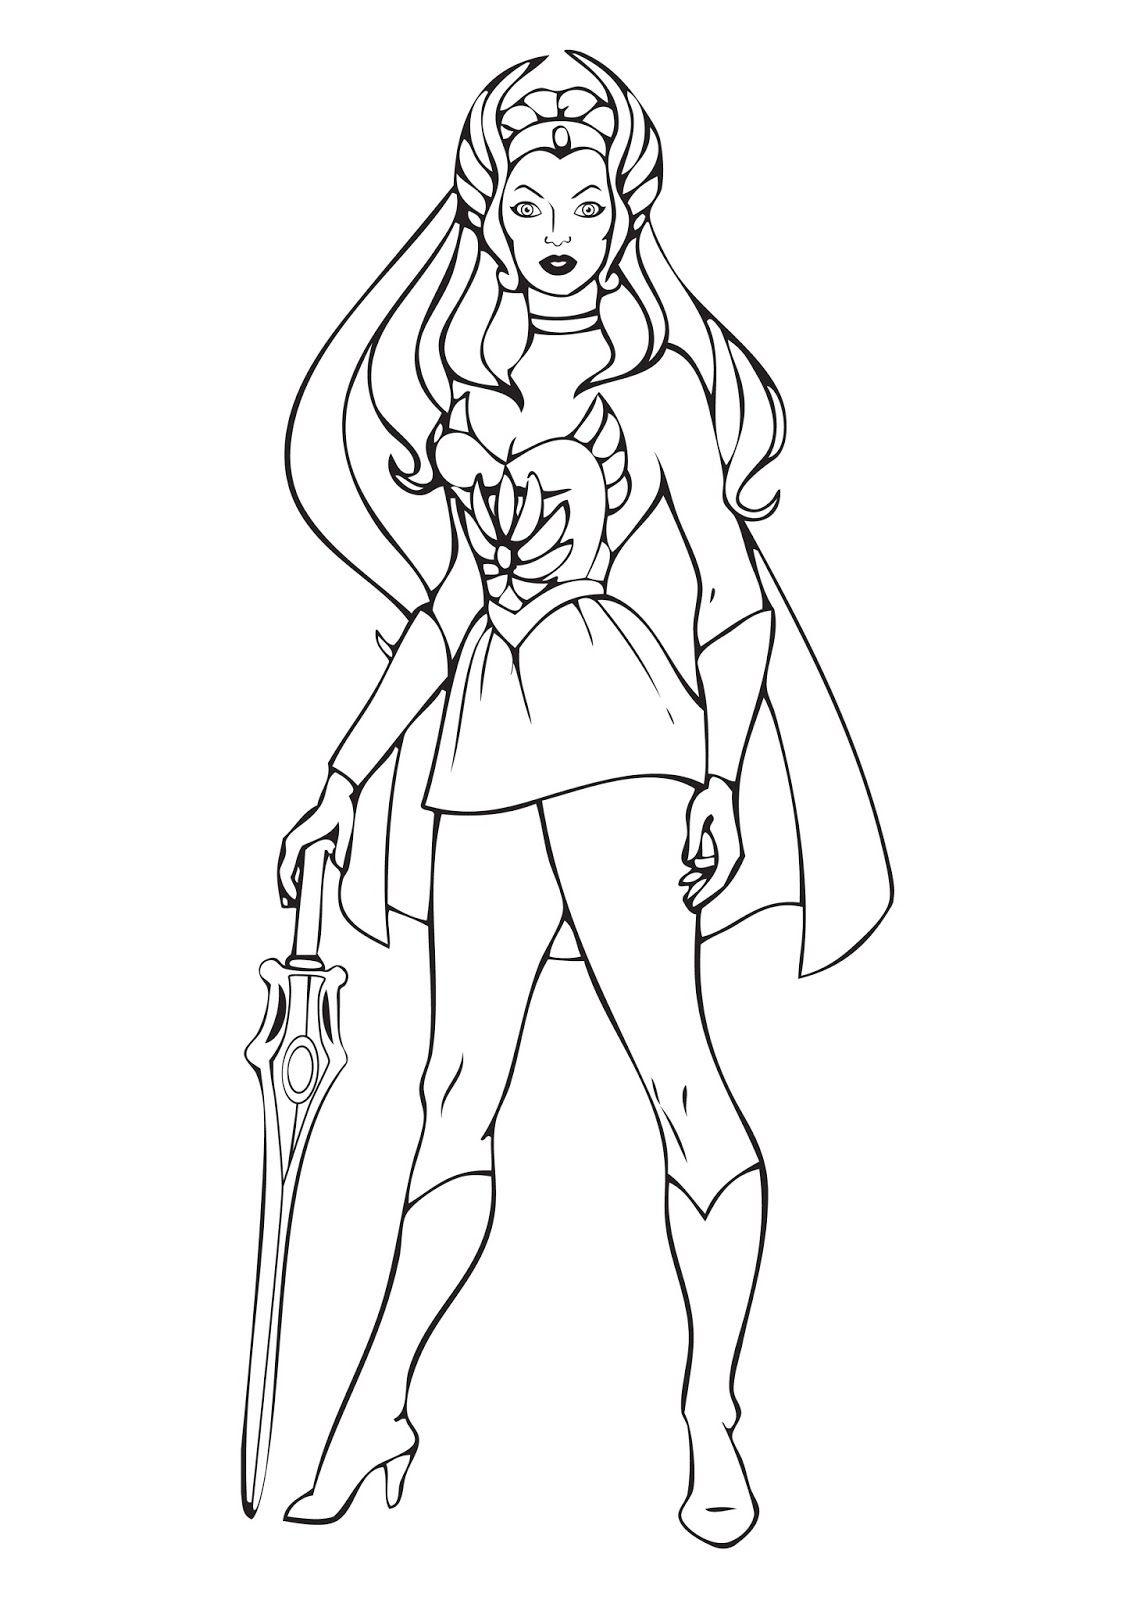 Desenhos de She-Ra para pintar, colorir, imprimir! Moldes e riscos ...